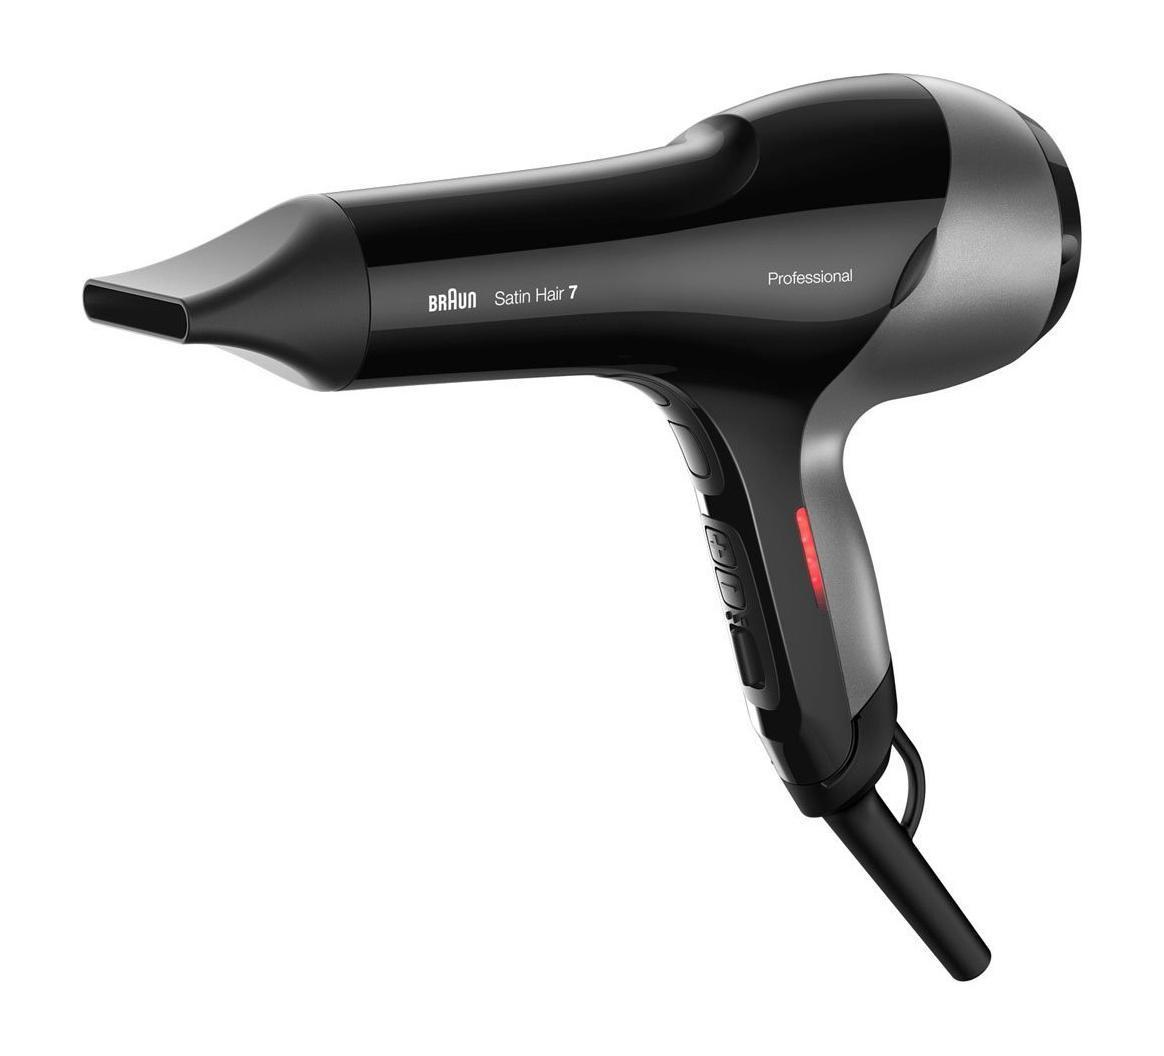 Braun Satin Hair 7 SensoDryer HD 780 фен ( 81475793 )